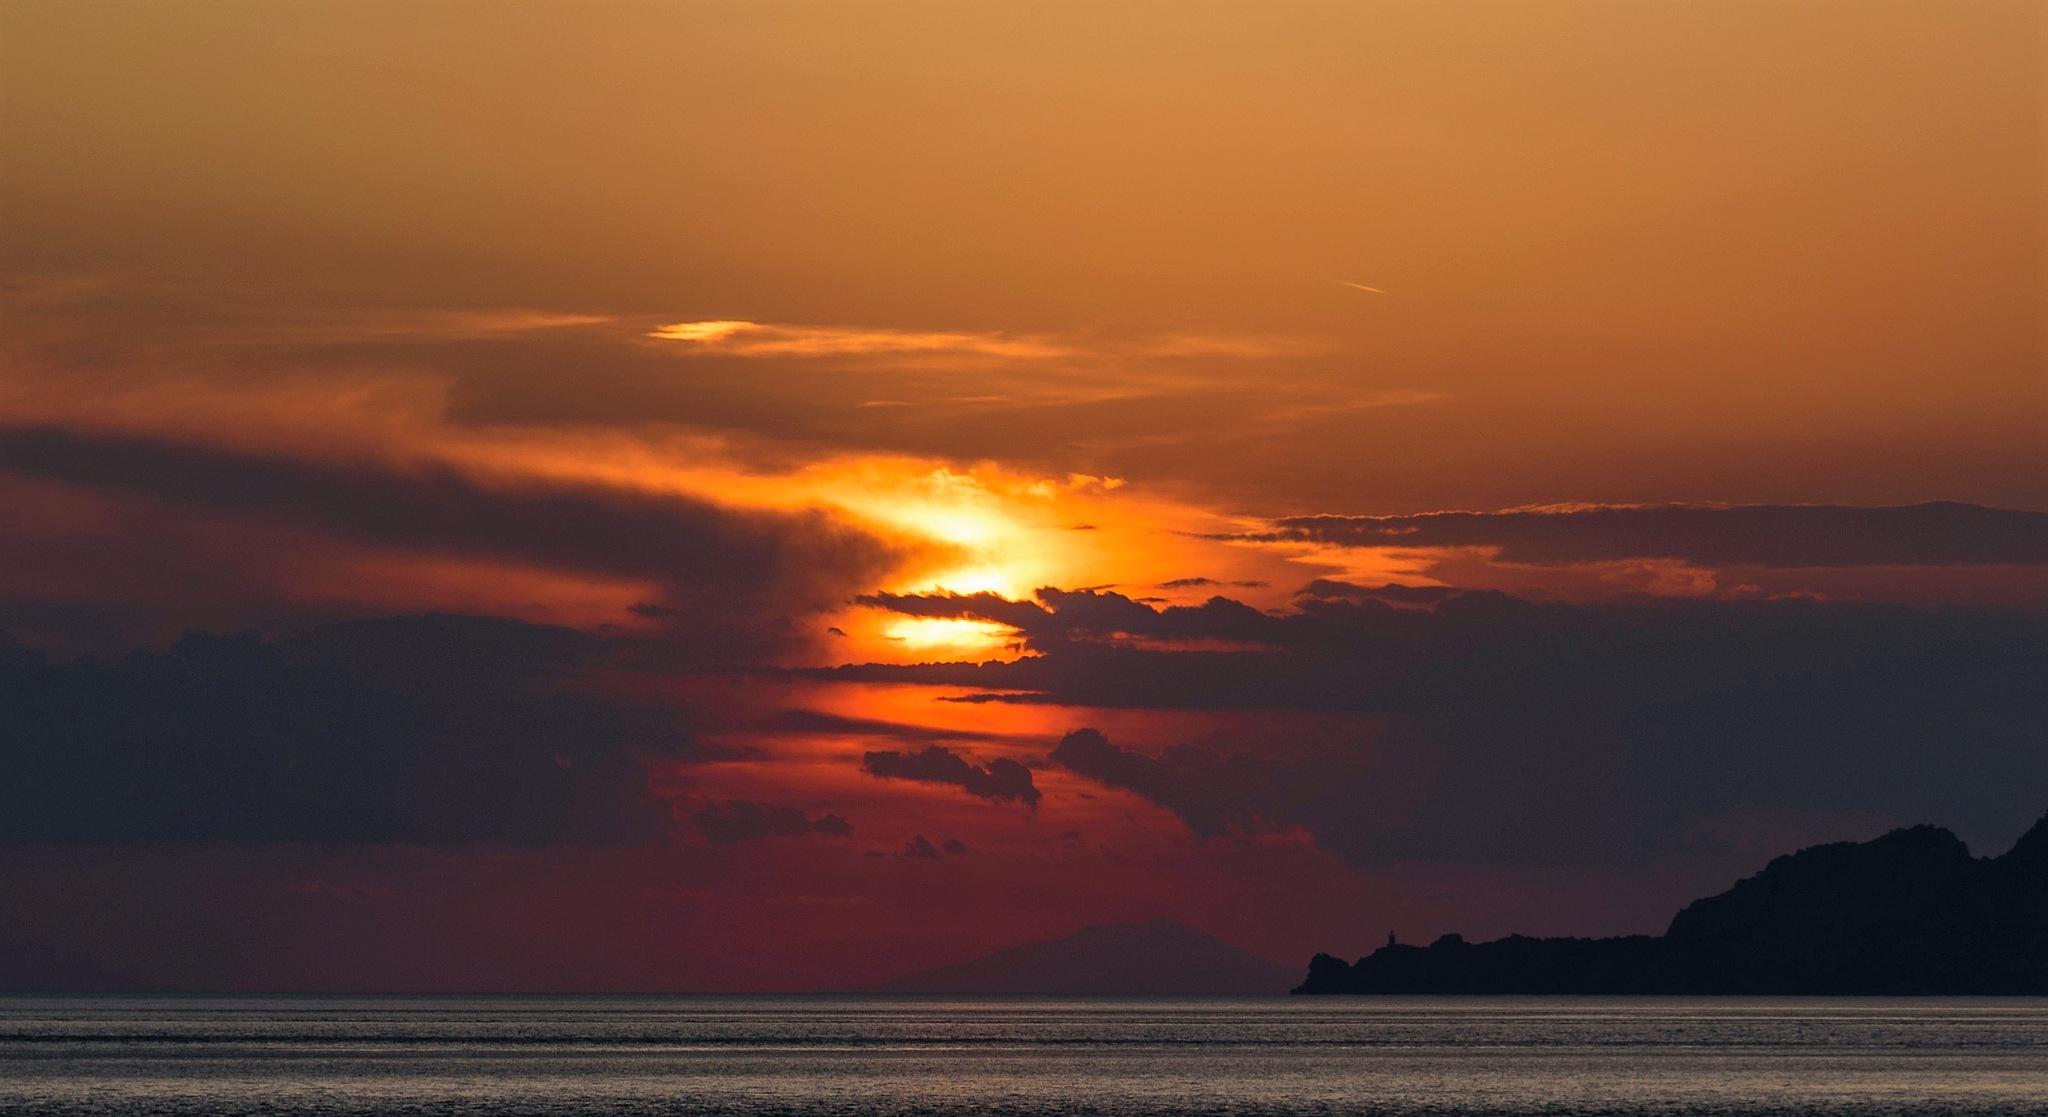 Dramatic sunset by Stamatis Vlahos